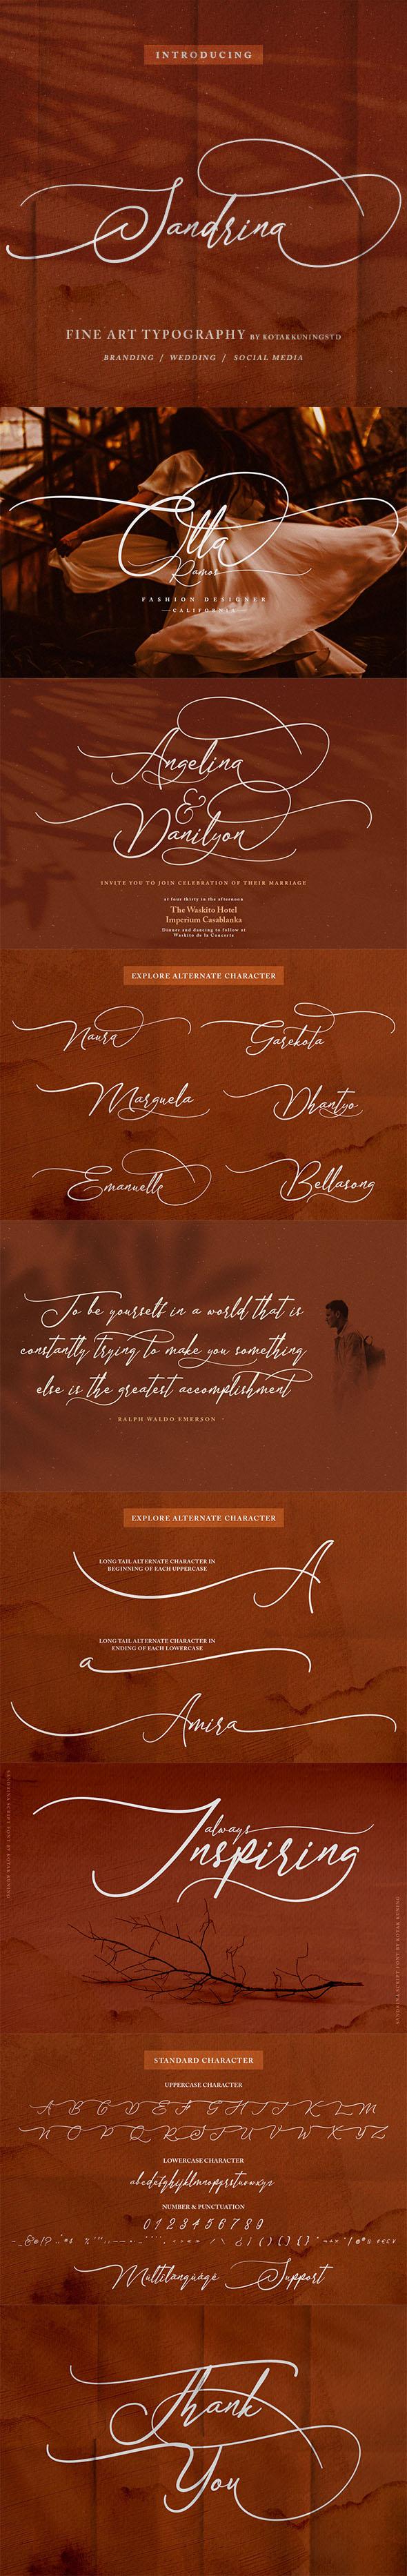 Sandrina- Elegant Script Font